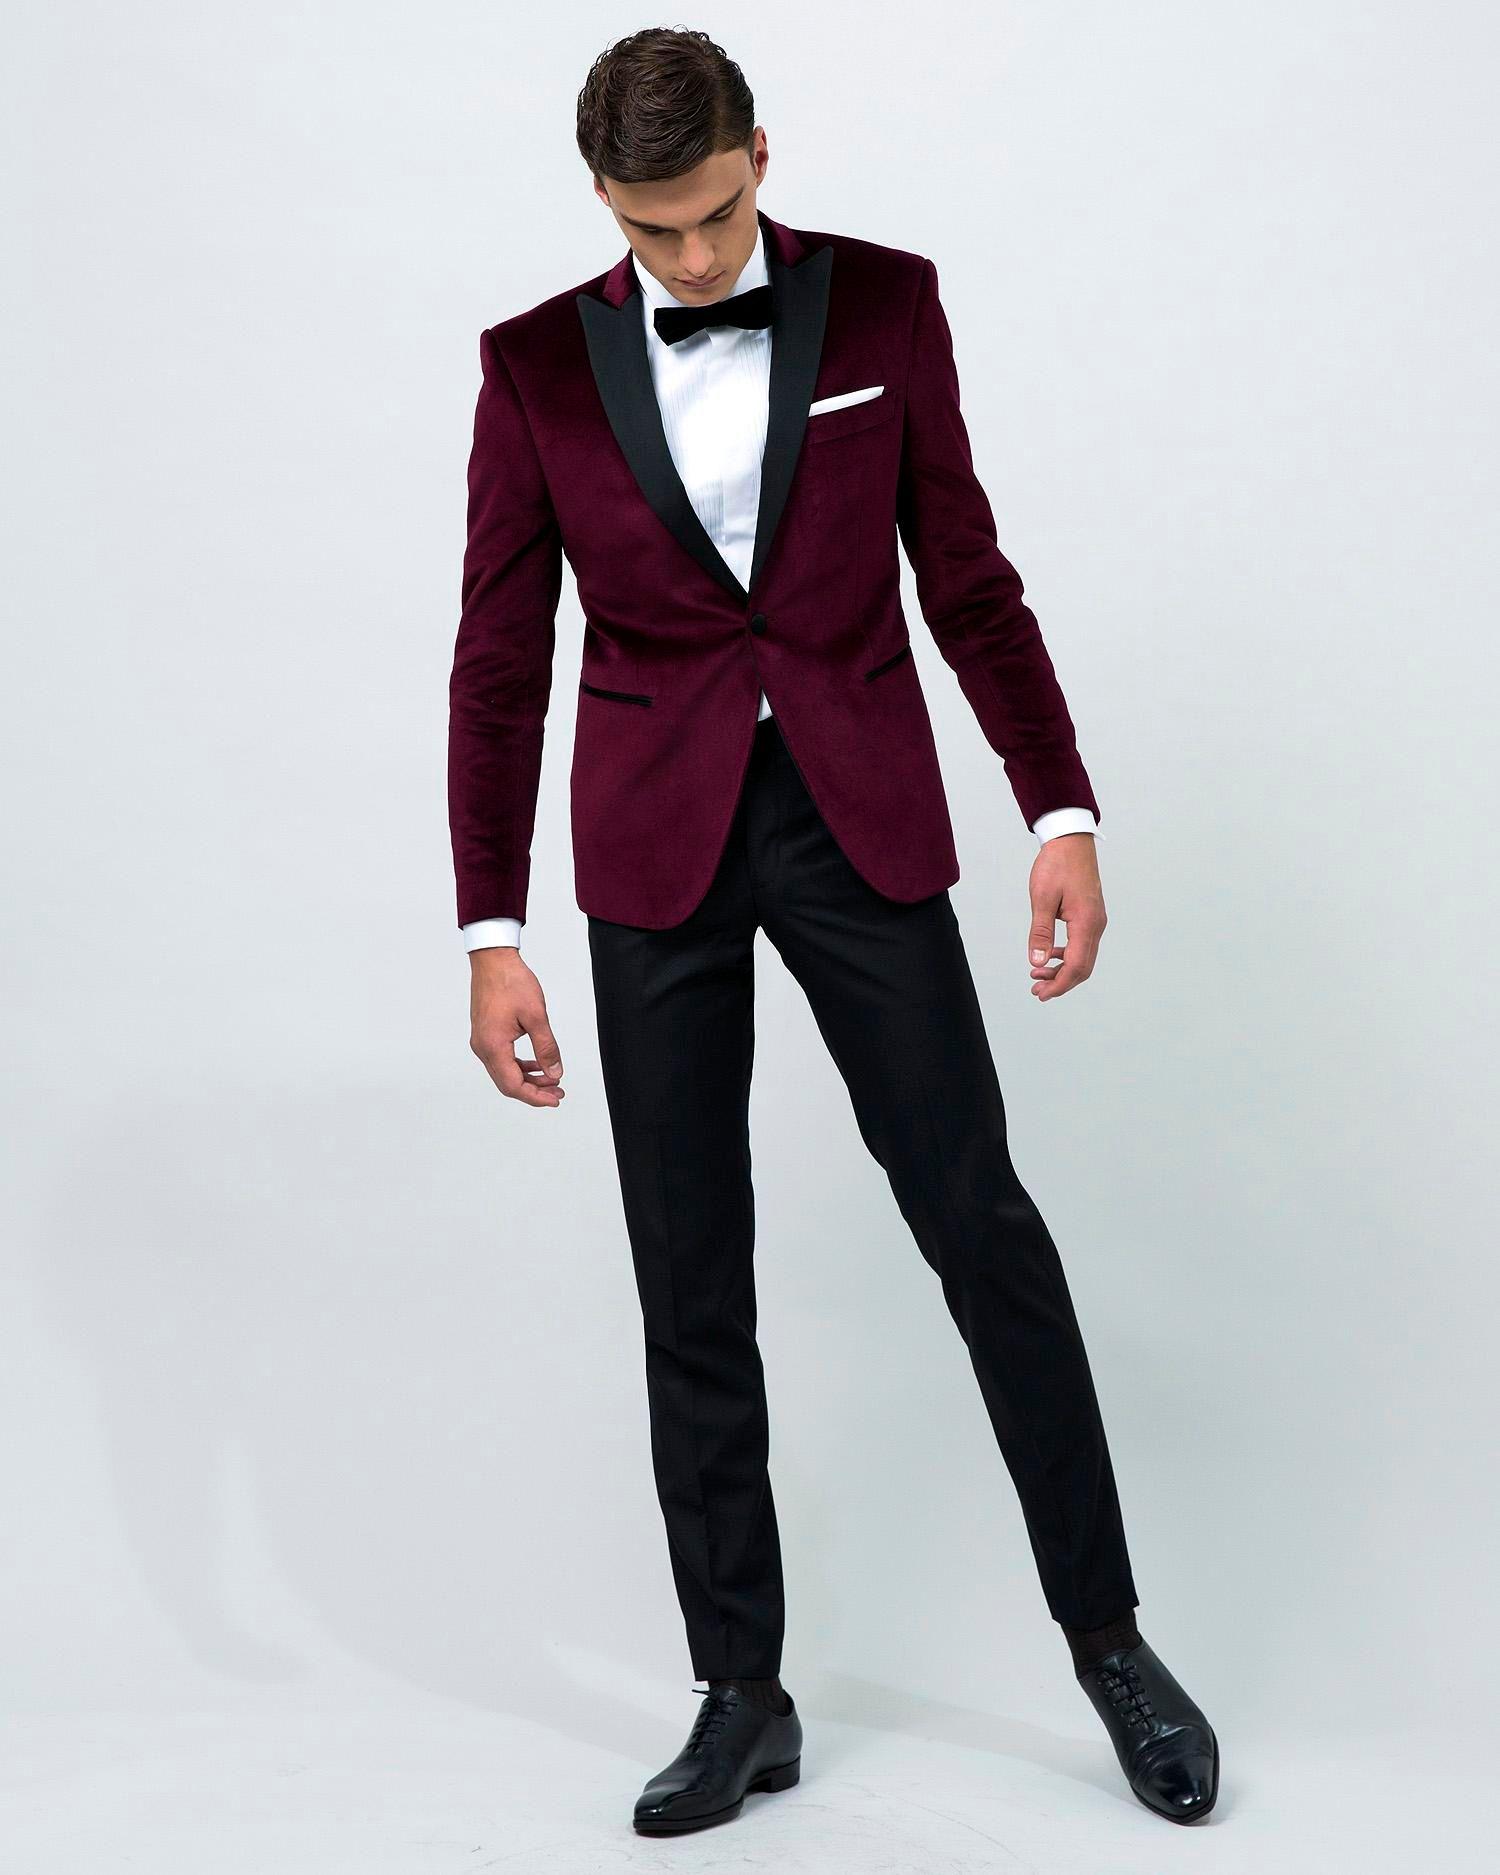 2016 Borgogna Velvet Groom Tuxedos Peak bavero groommens adatta / Abiti da sposa su misura uomo jakcet + pantaloni + cravatta + tasche